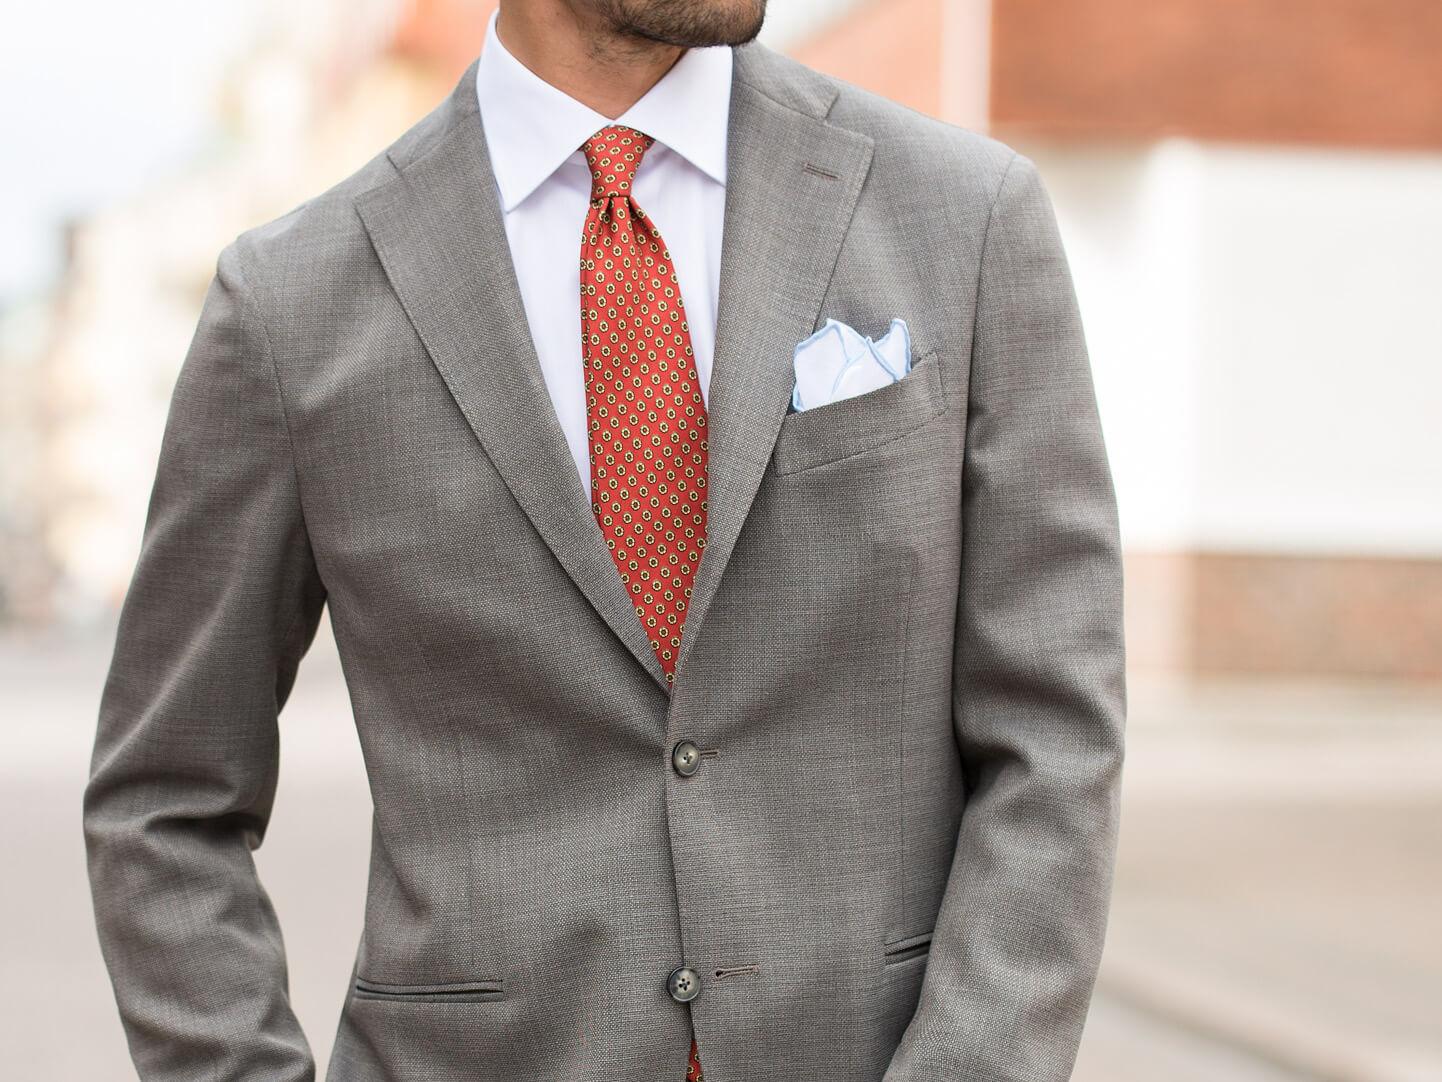 839dc7273b5 Kombiner slips og lommeklud   CareOfCarl.dk